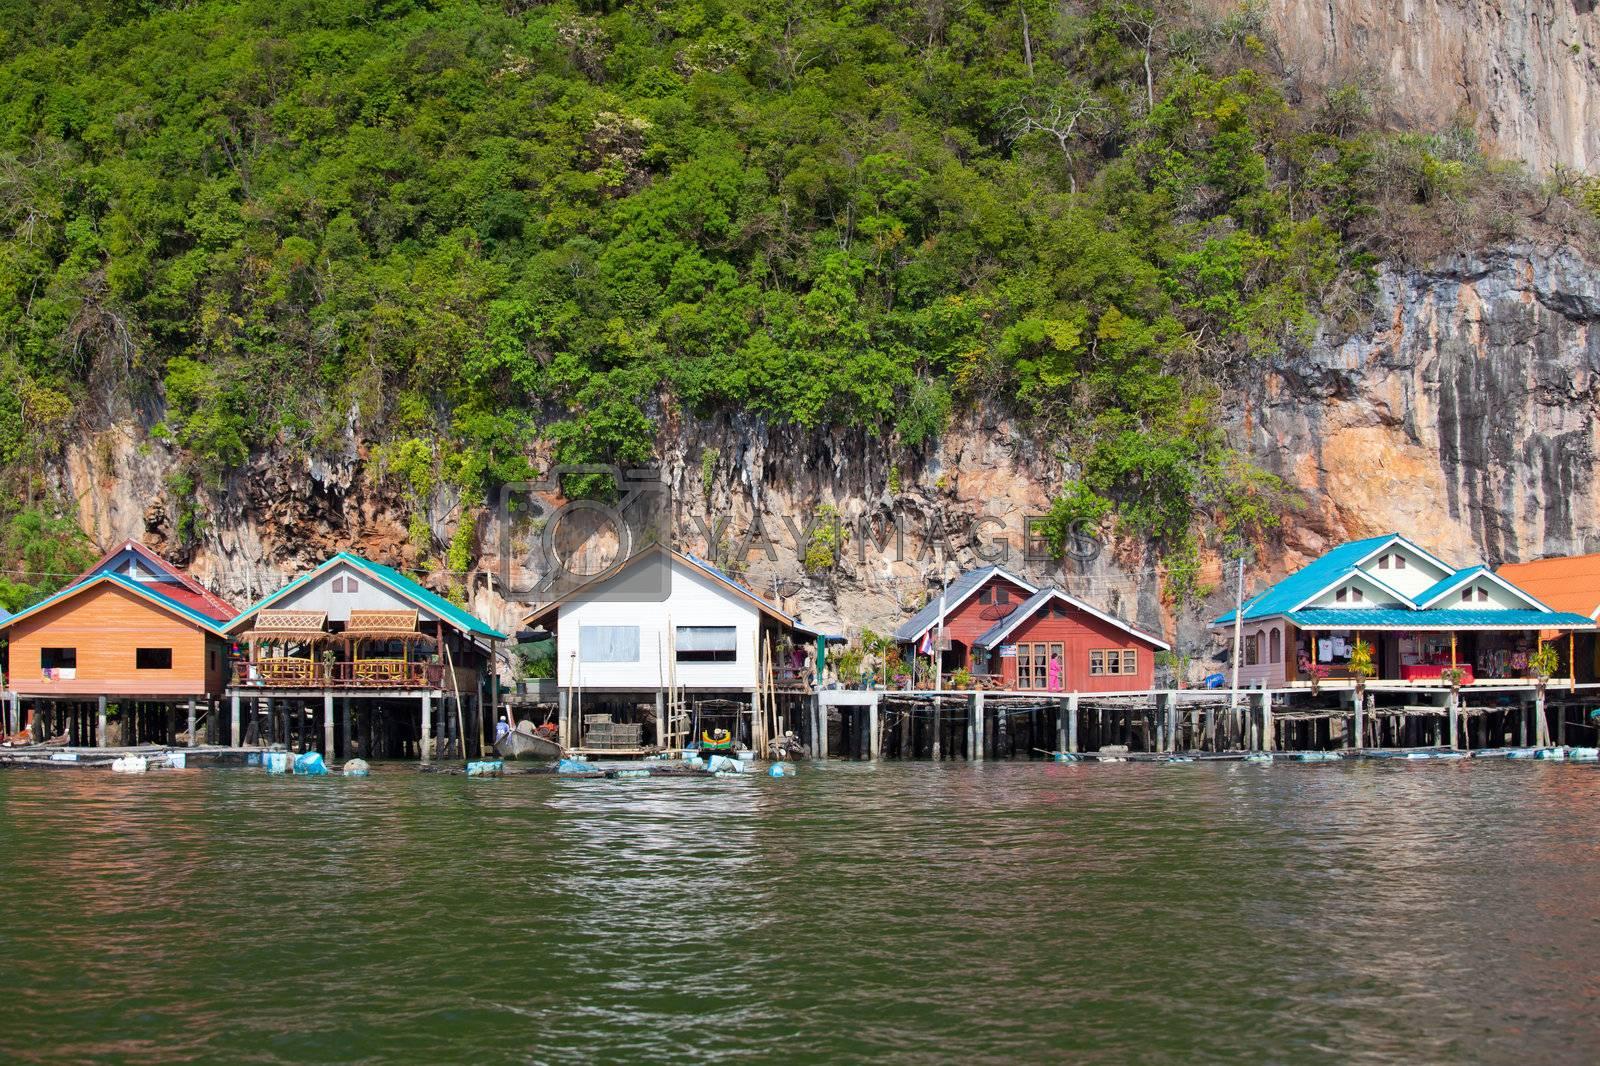 Fishermen's Village by witthaya